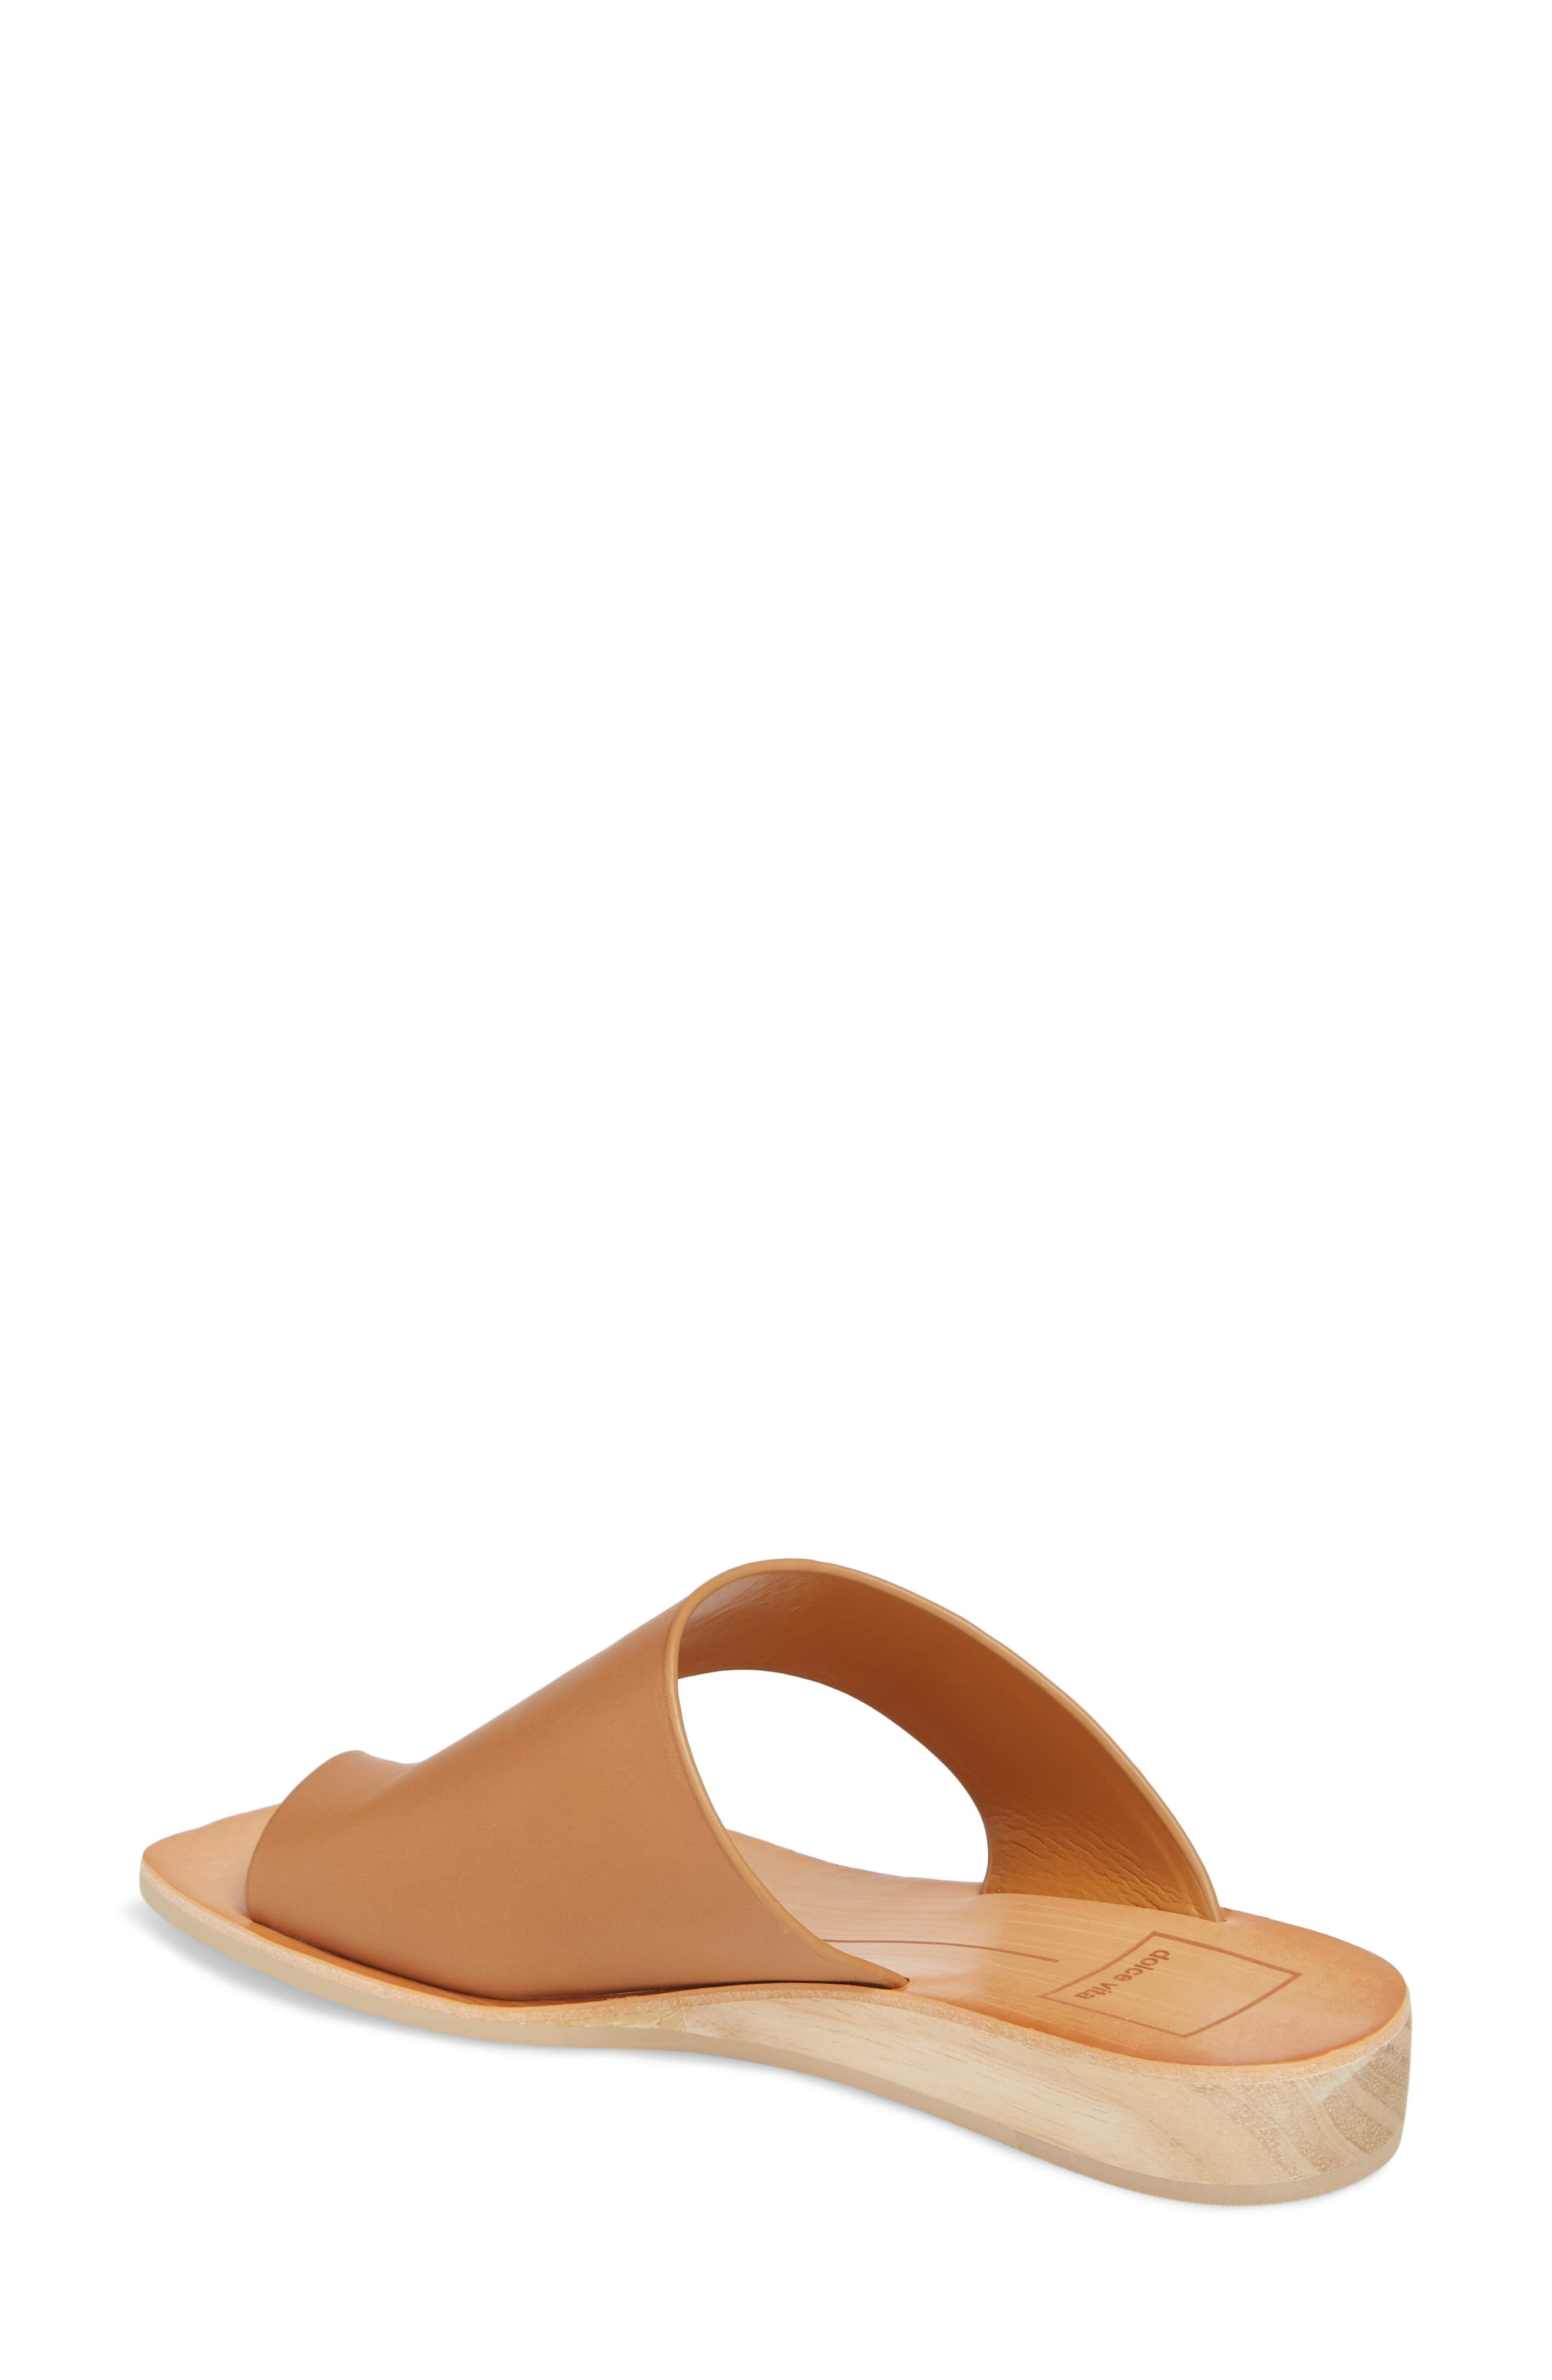 Hazle Asymmetrical Toe Loop Sandal,                             Alternate thumbnail 2, color,                             Caramel